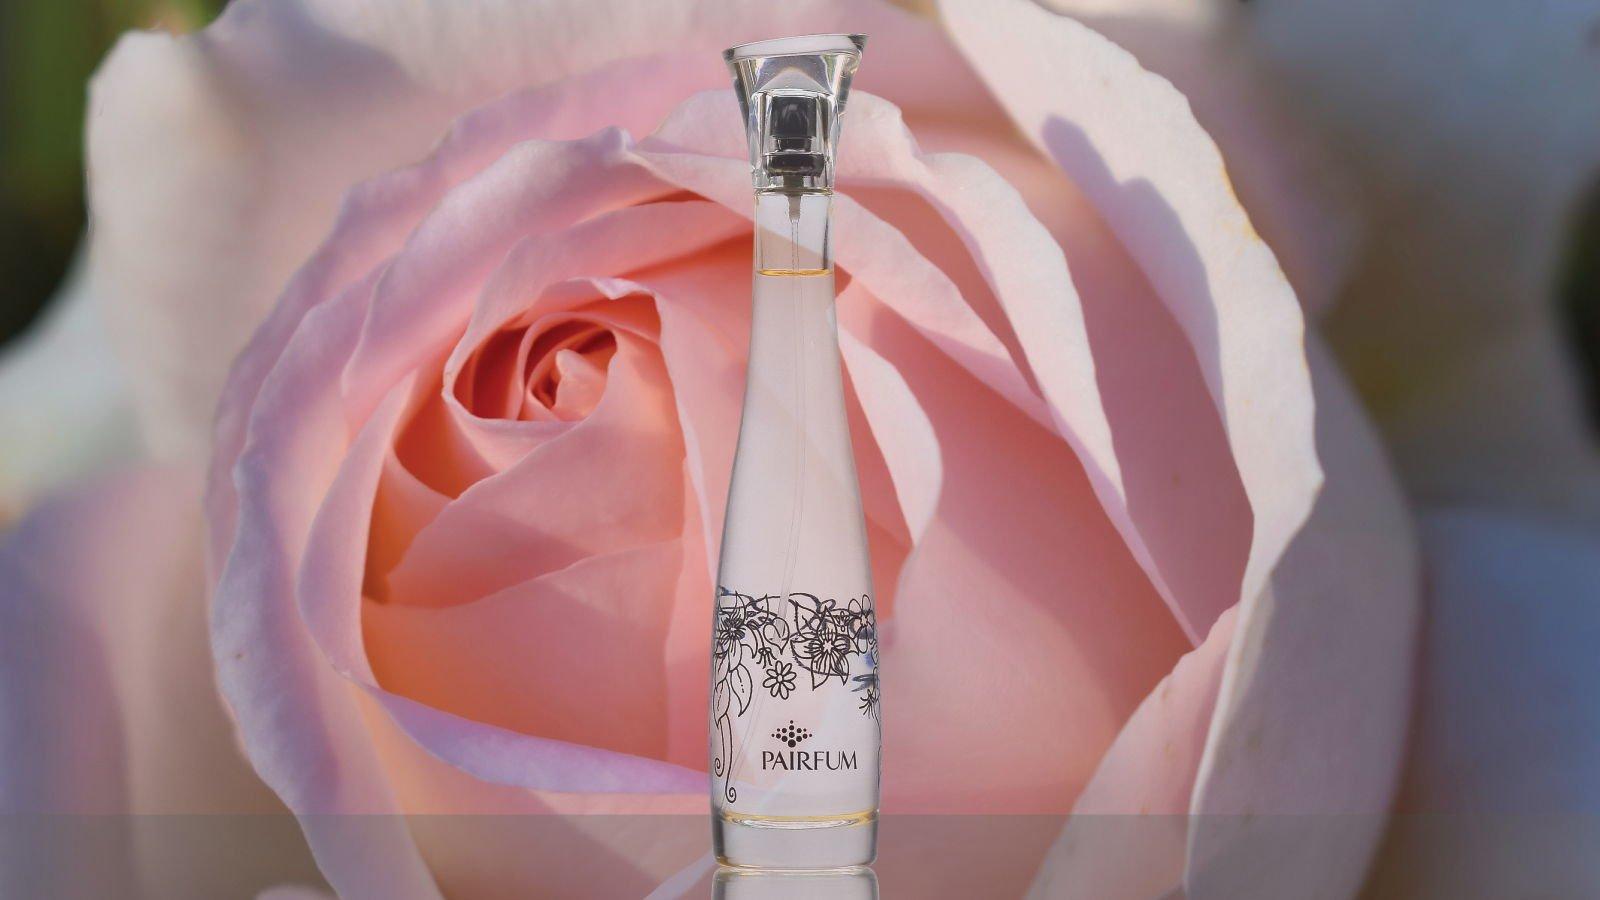 Flacon Room Perfume Spray Rose Pink Flower 16 9